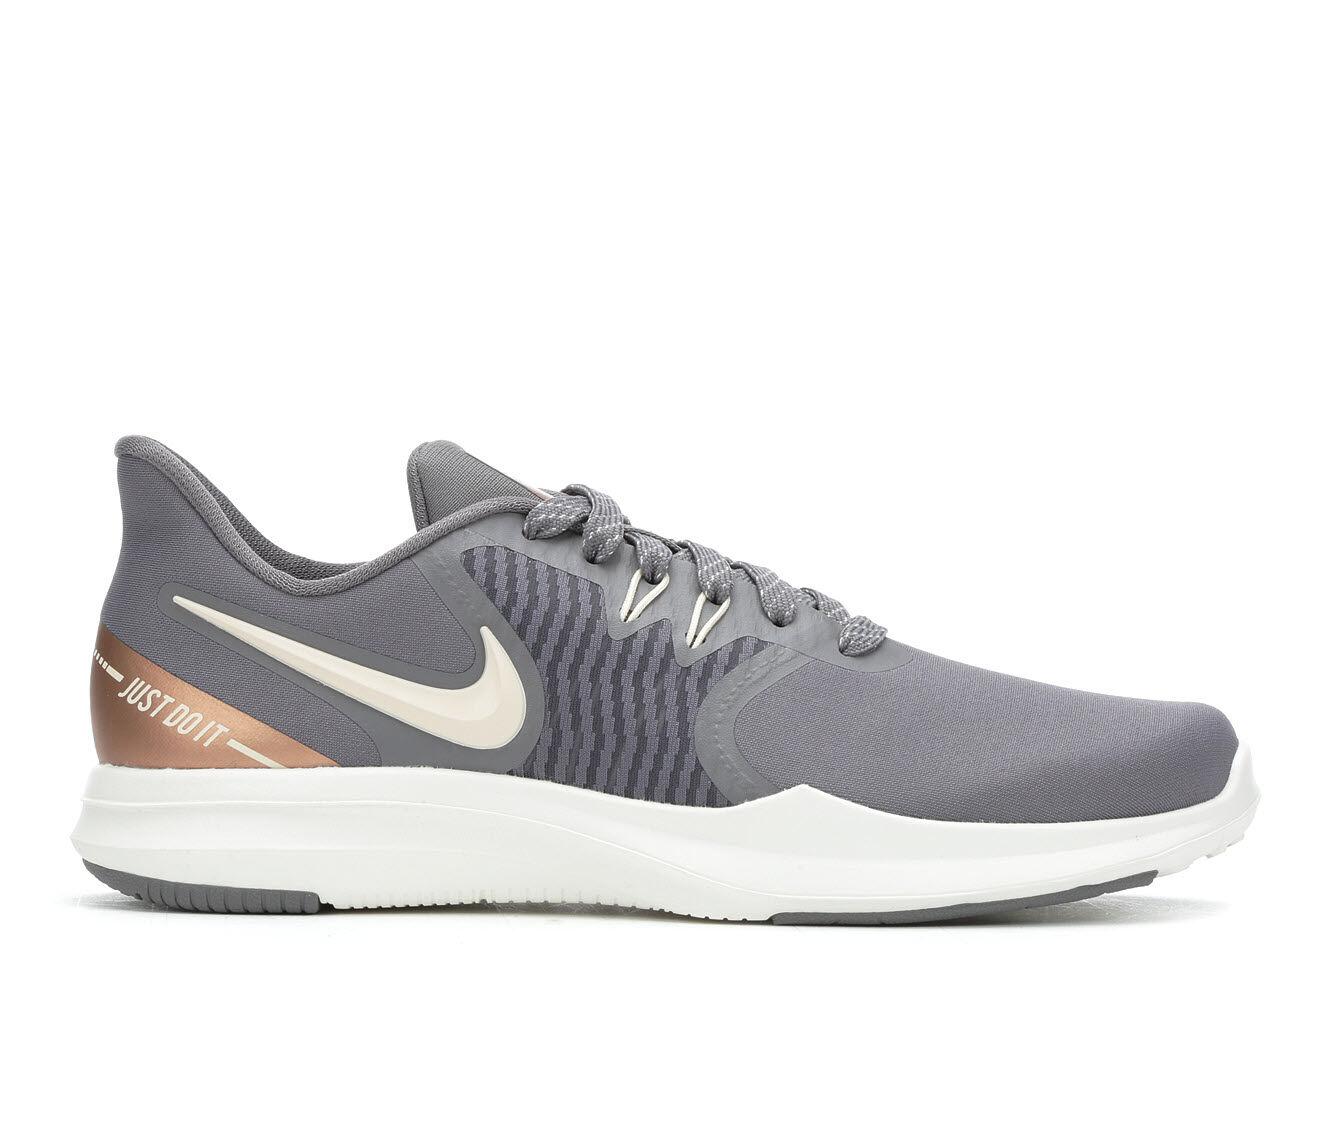 Women's Nike In-Season TR 8 AMP Training Shoes Grey/Red Bronze